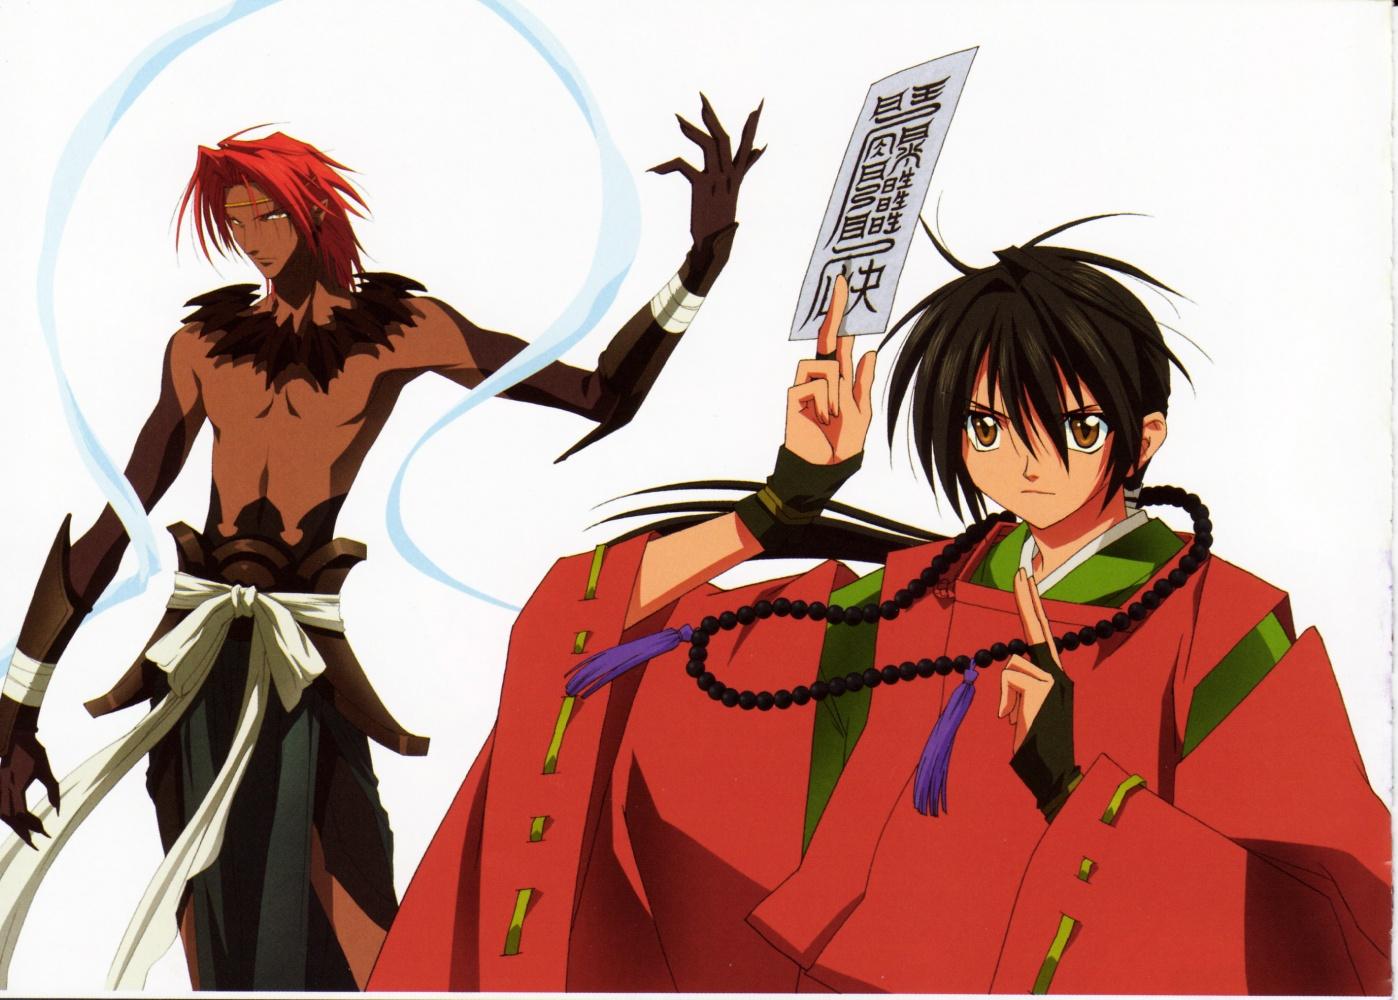 Shonen Onmyouji Wallpaper and Background Image | 1398x1000 | ID ...